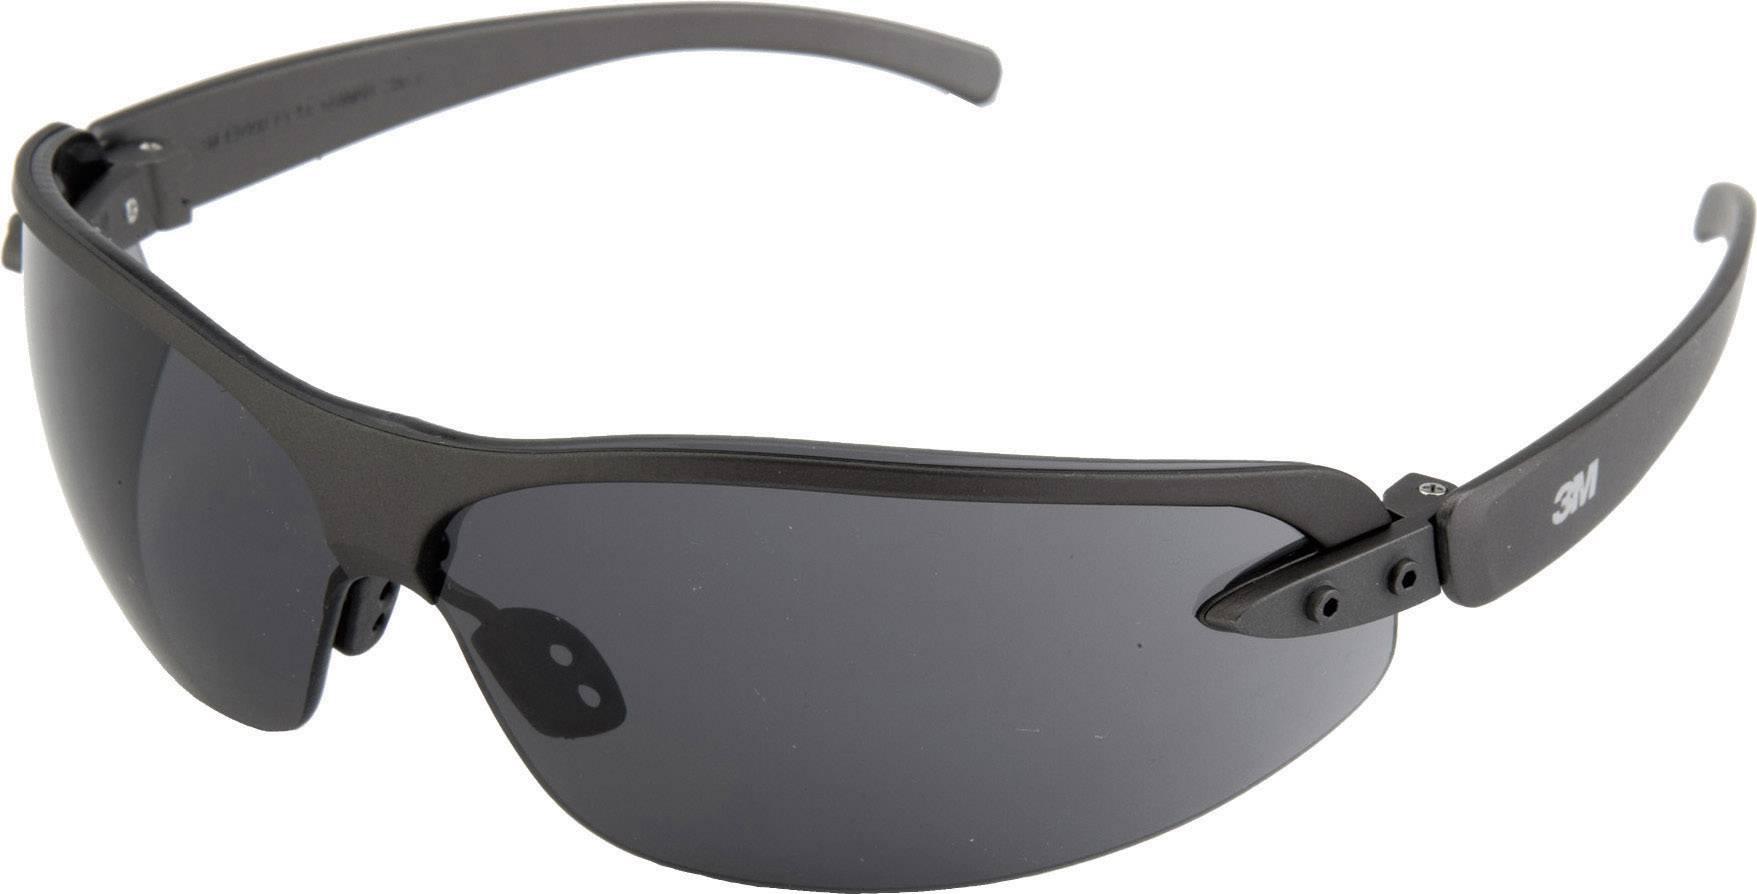 Ochranné okuliare 3M 1200E